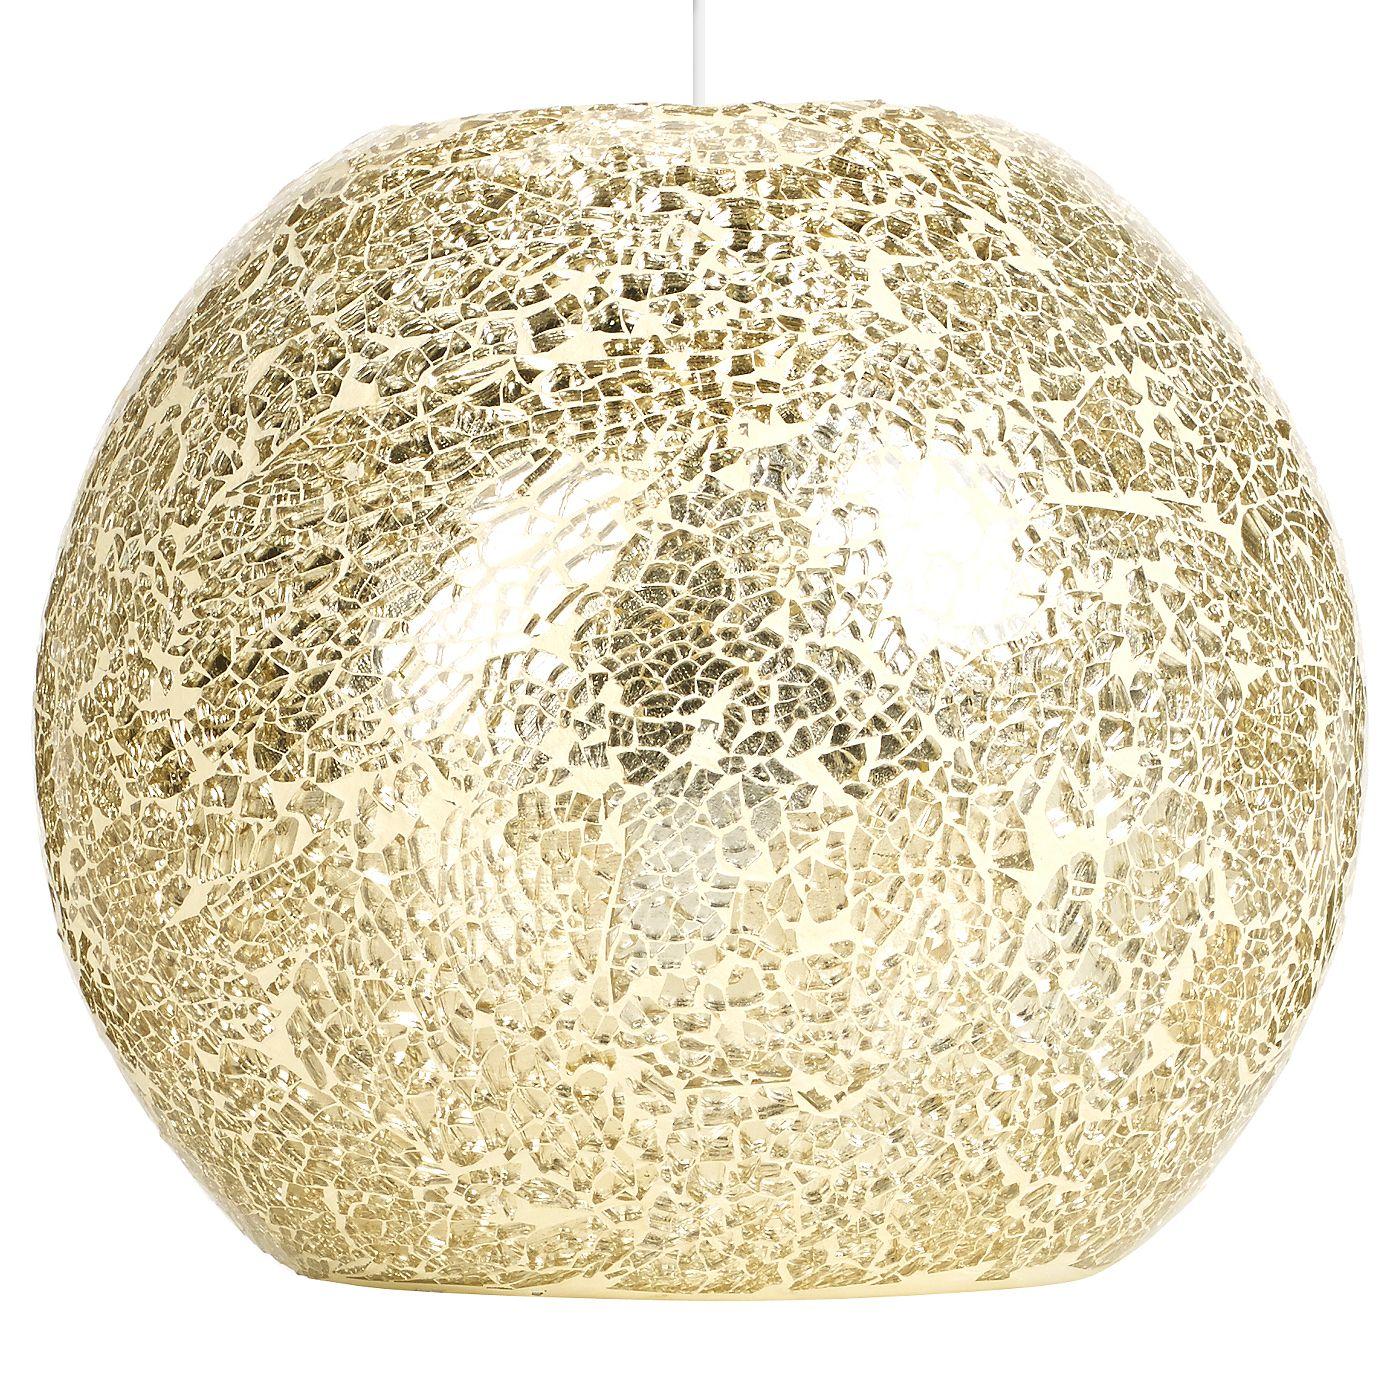 George Home Champagne Mosaic Pendant Light Shade Pendant Lighting Asda Direct Light Shades